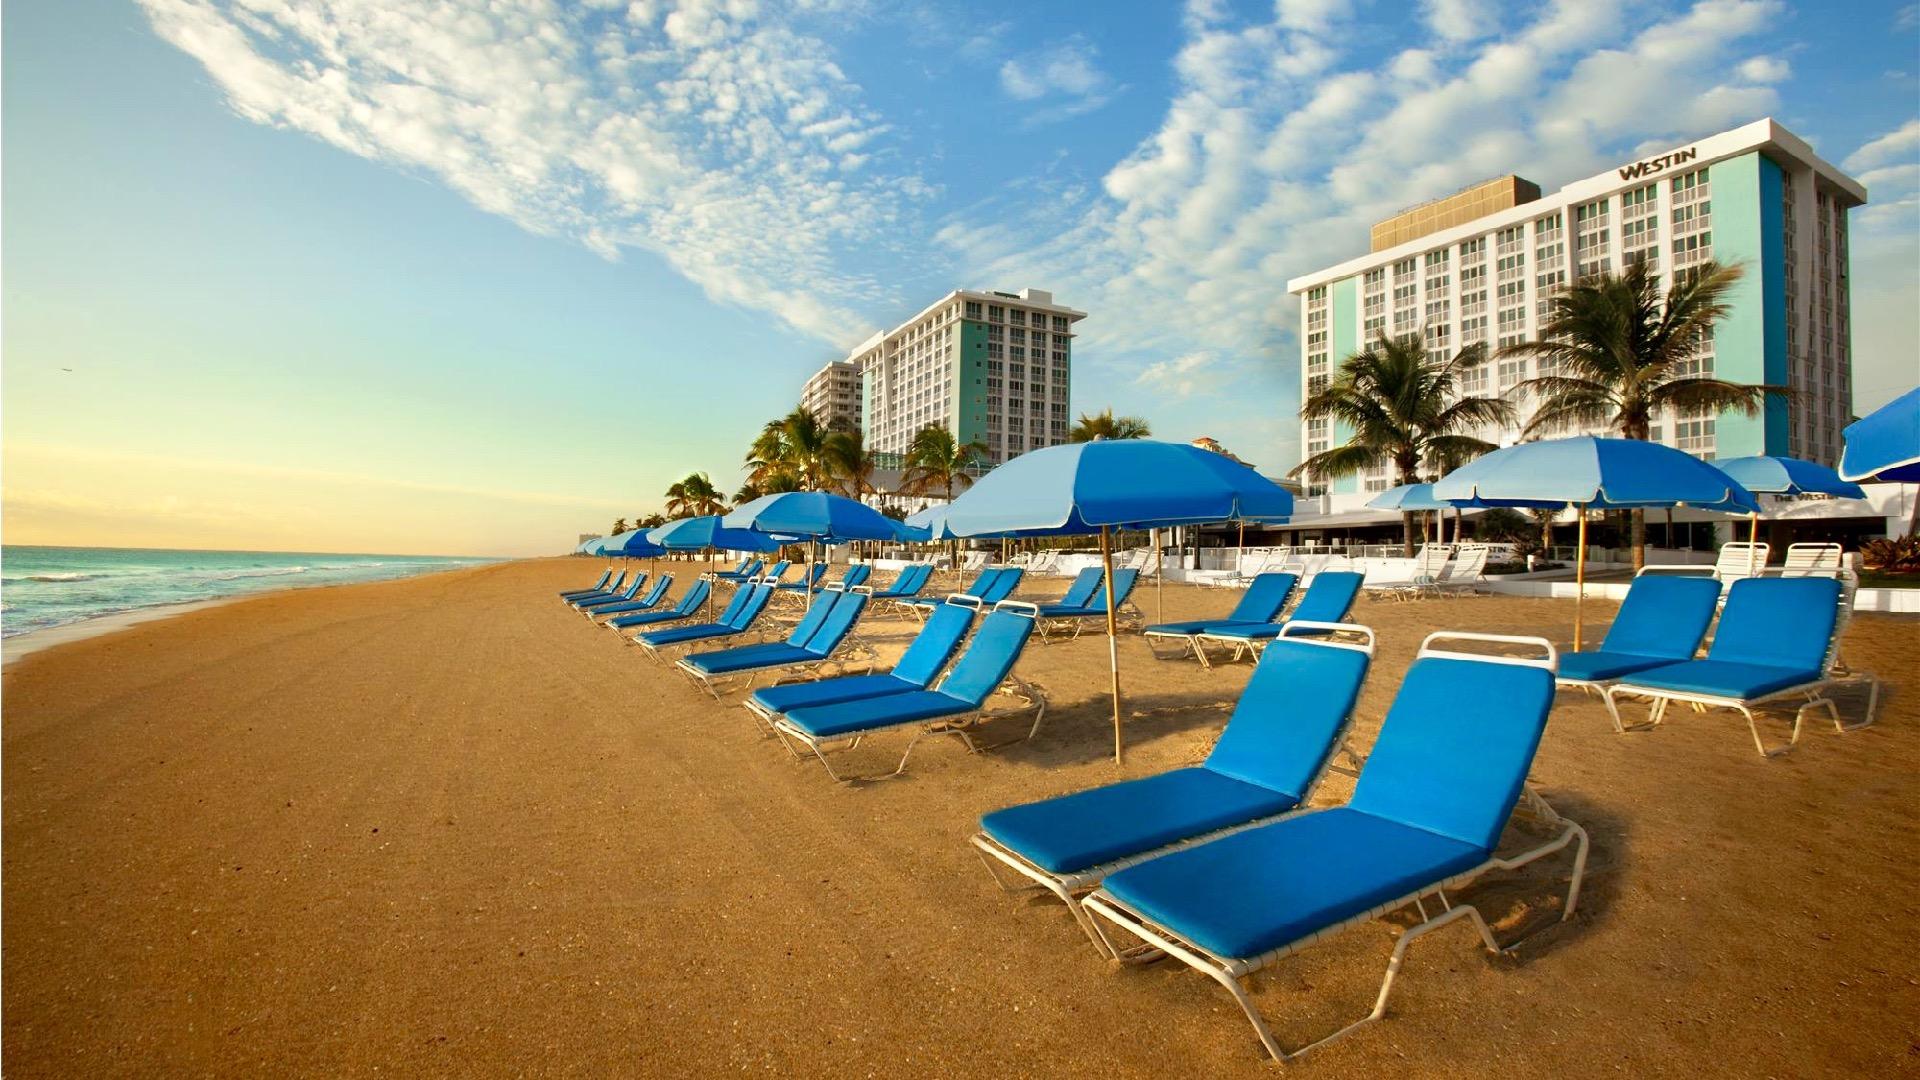 Heavenly Spa The Westin Fort Lauderdale Beach Resort